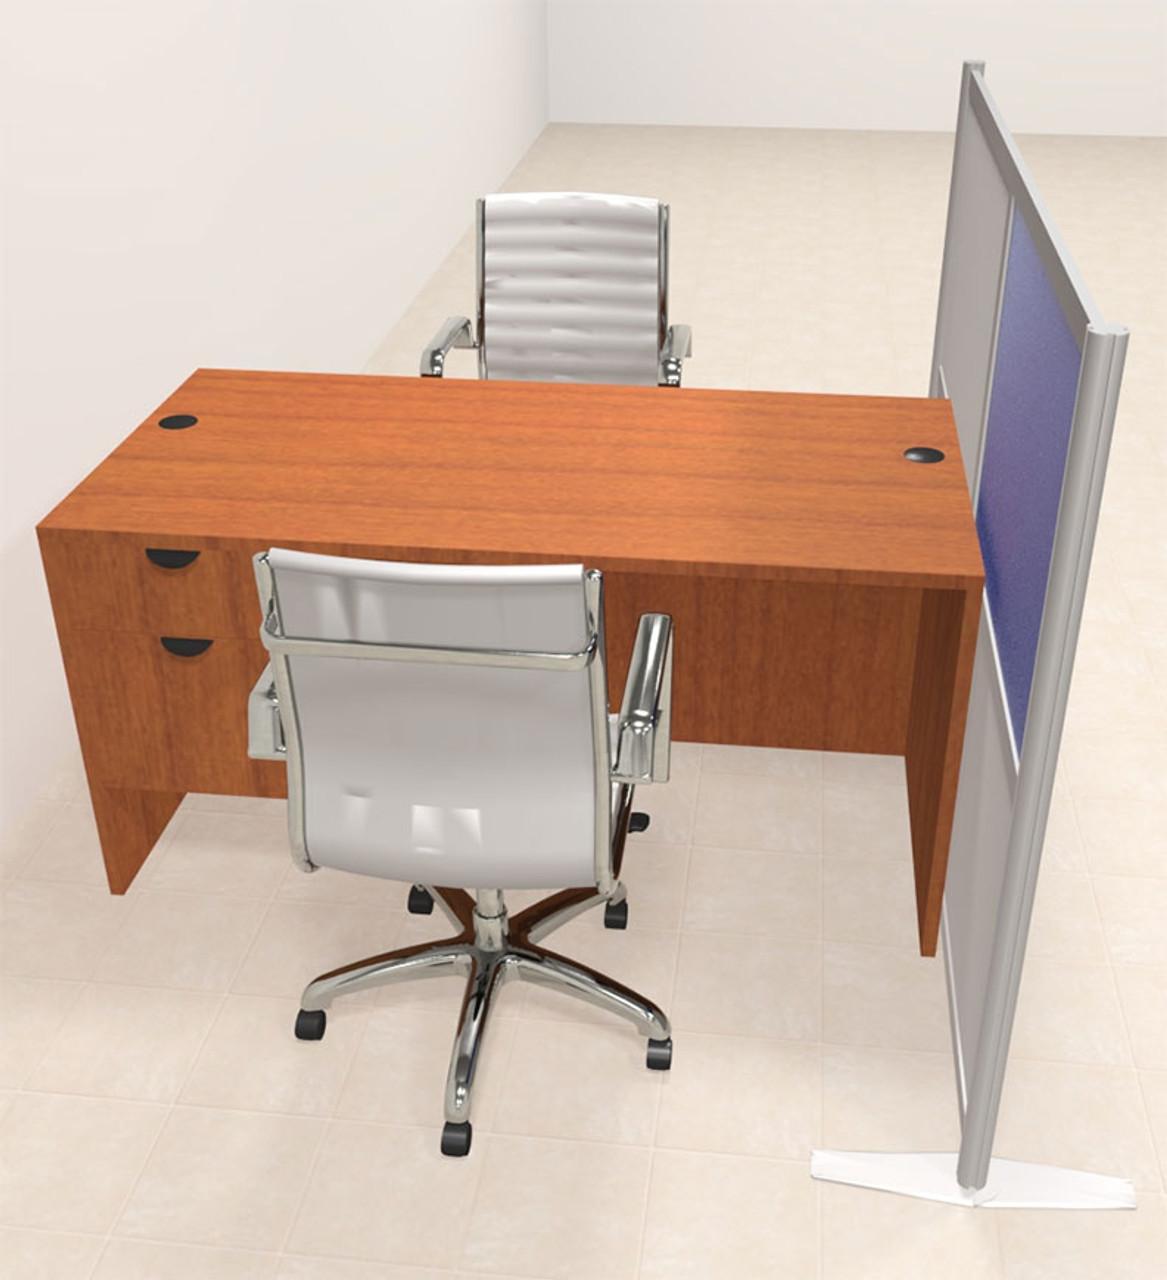 One Person Workstation w/Acrylic Aluminum Privacy Panel, #OT-SUL-HPB49